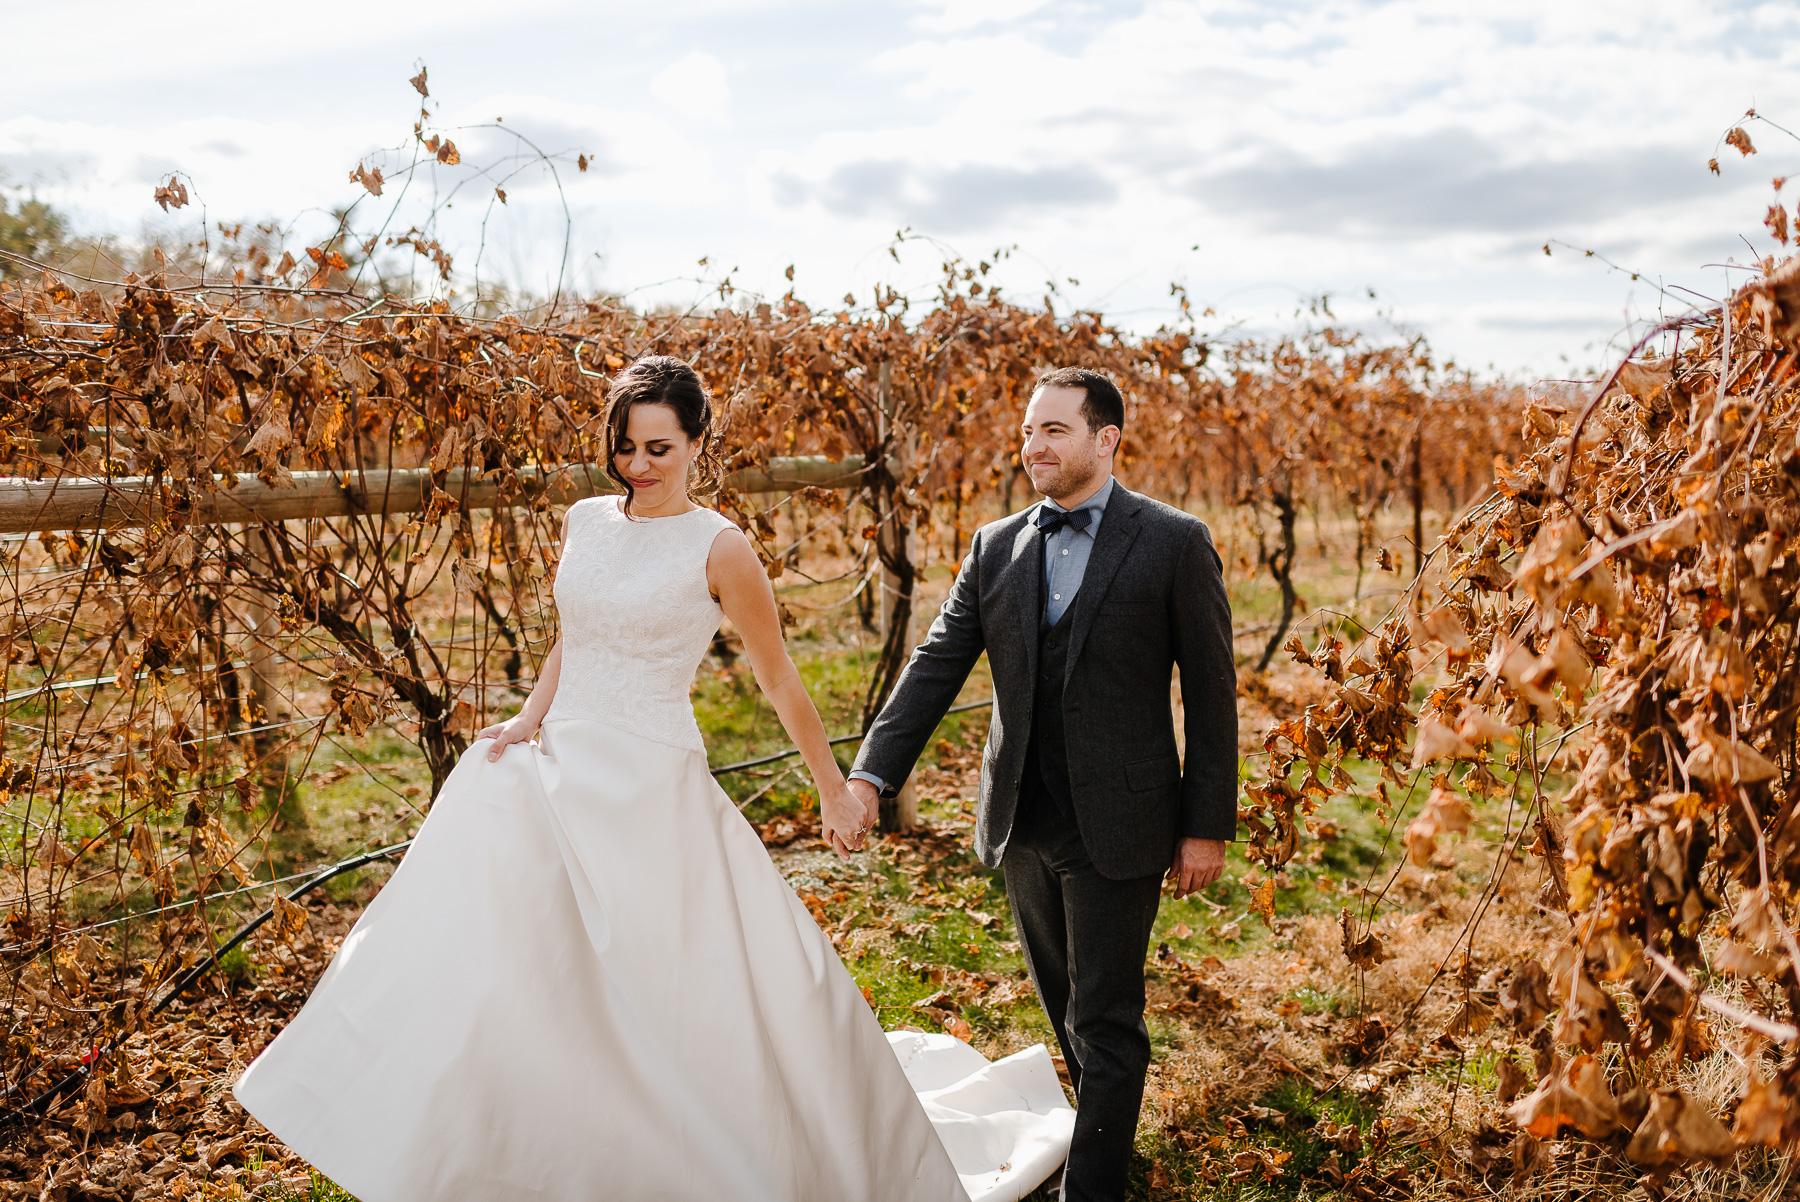 52-Laurita Winery Wedding New Jersey Wedding Photographer Laurita Winery Weddings Longbrook Photography.jpg